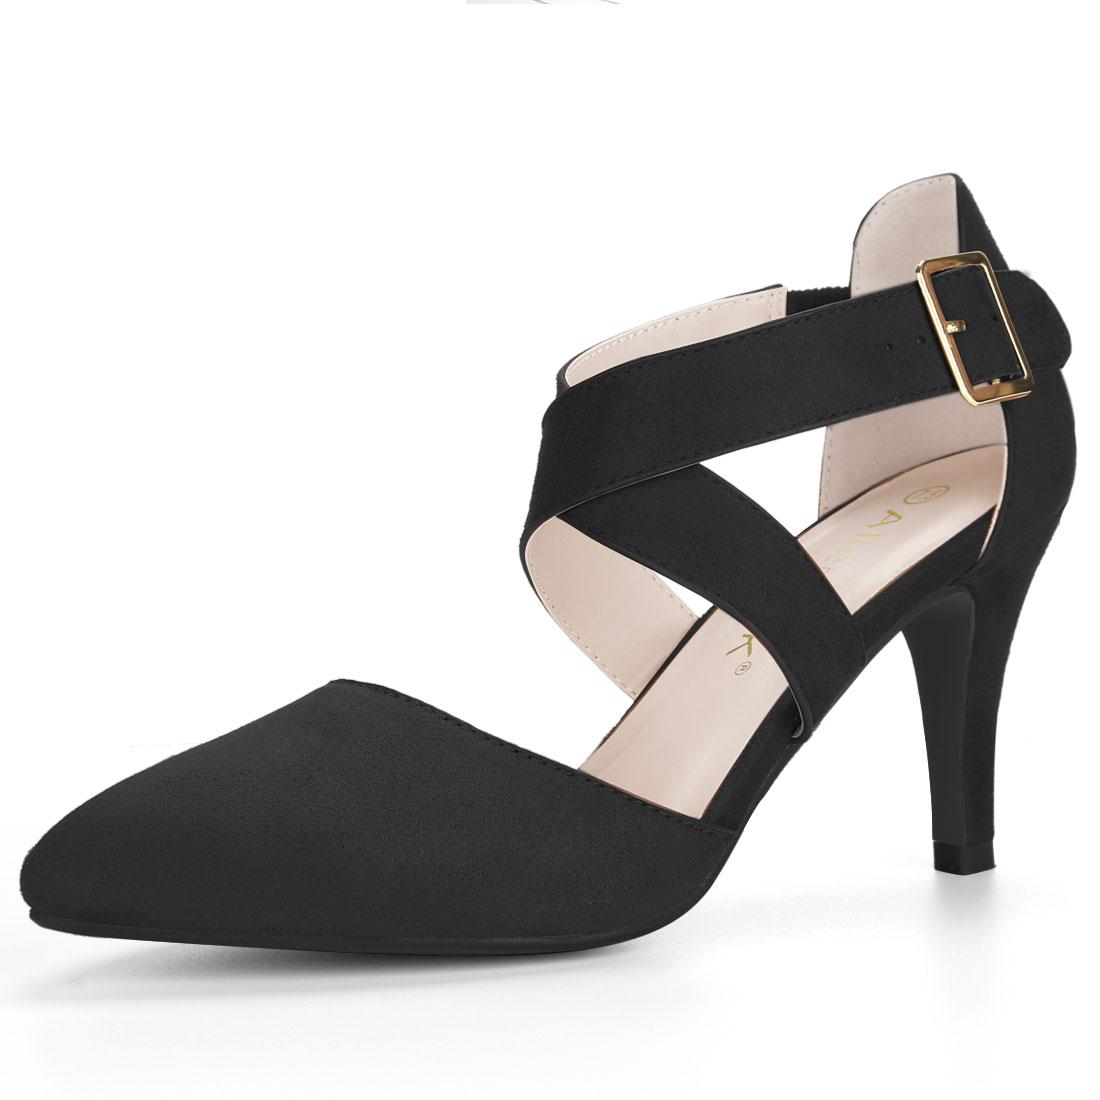 Allegra K Women's Crisscross Straps Stiletto Heel Ankle Strap Pumps Black US 6